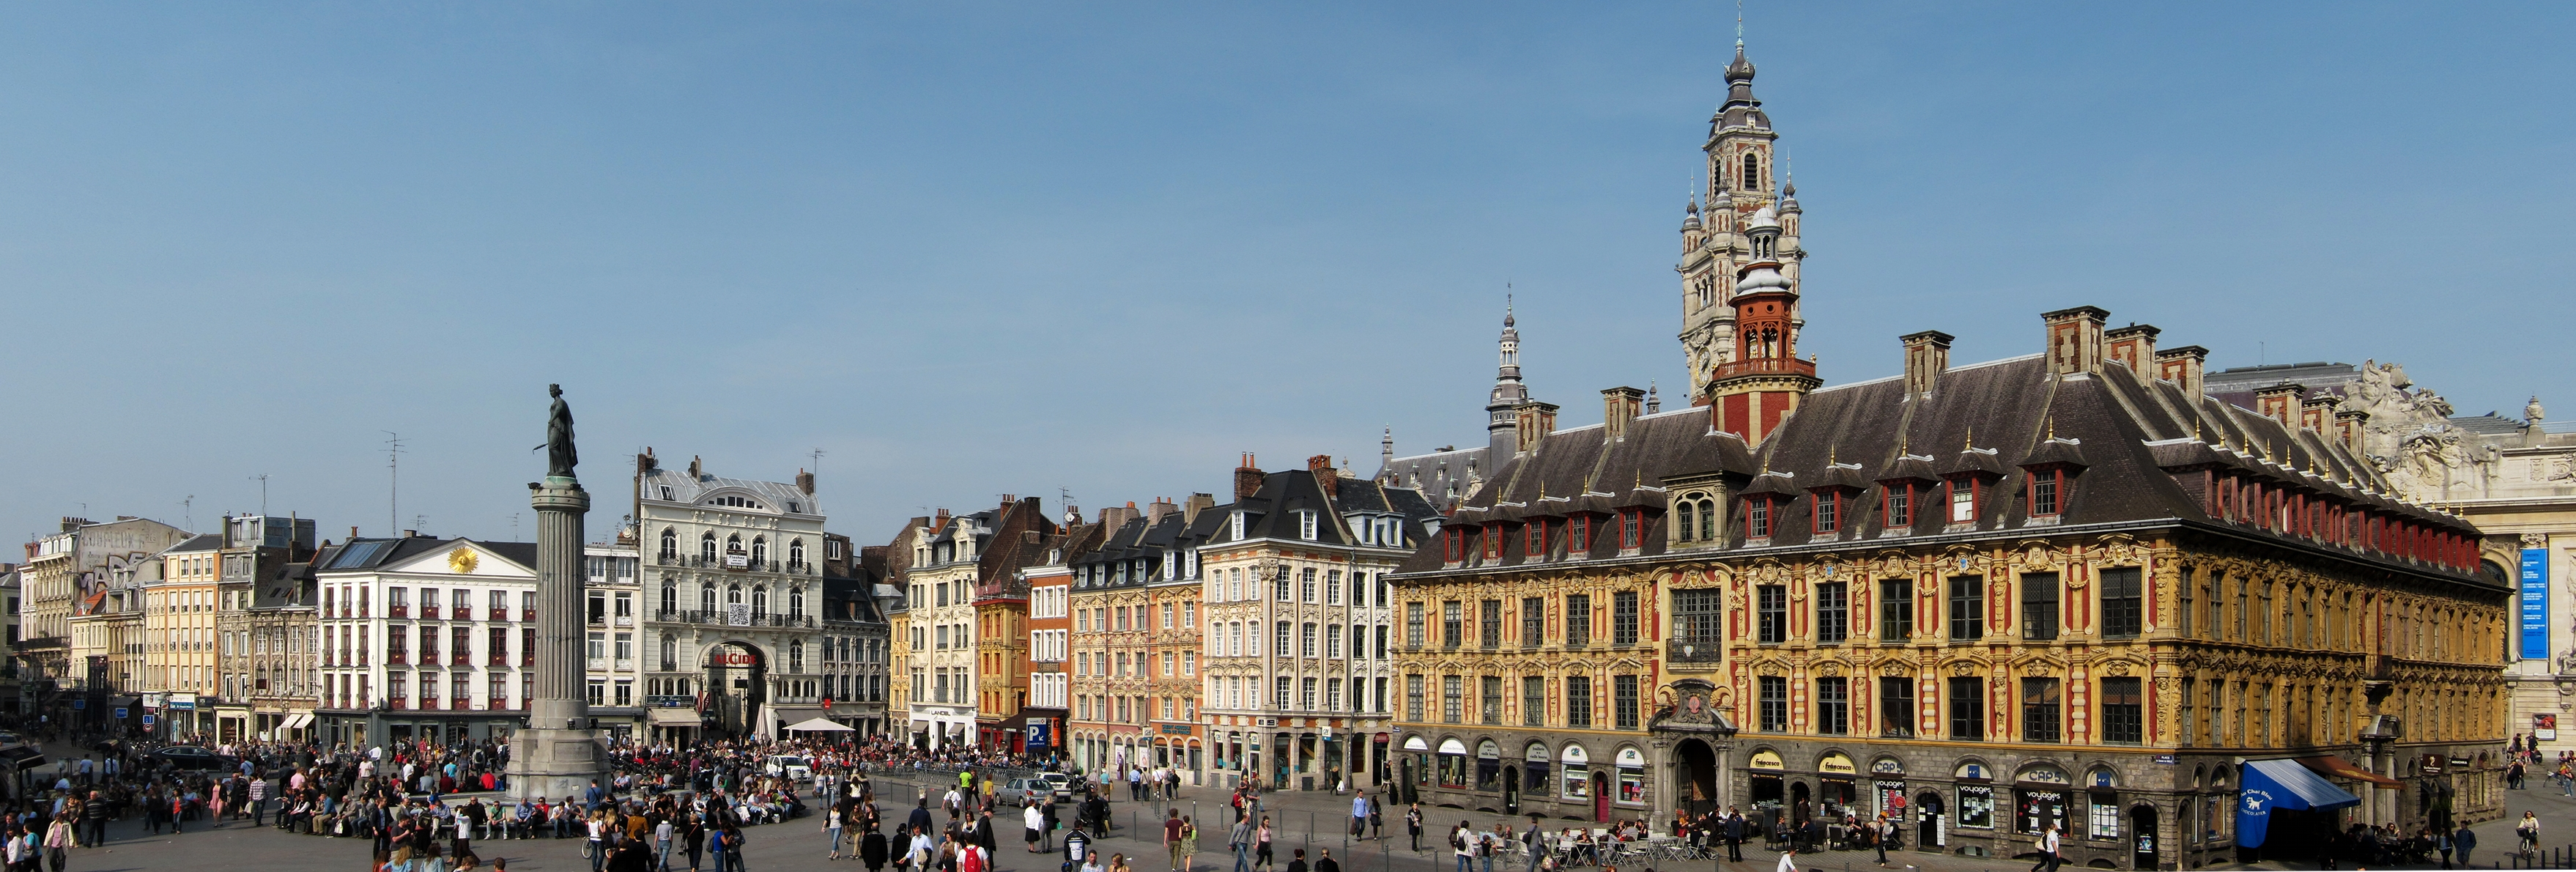 Lille Grand Place Danco Restaurant